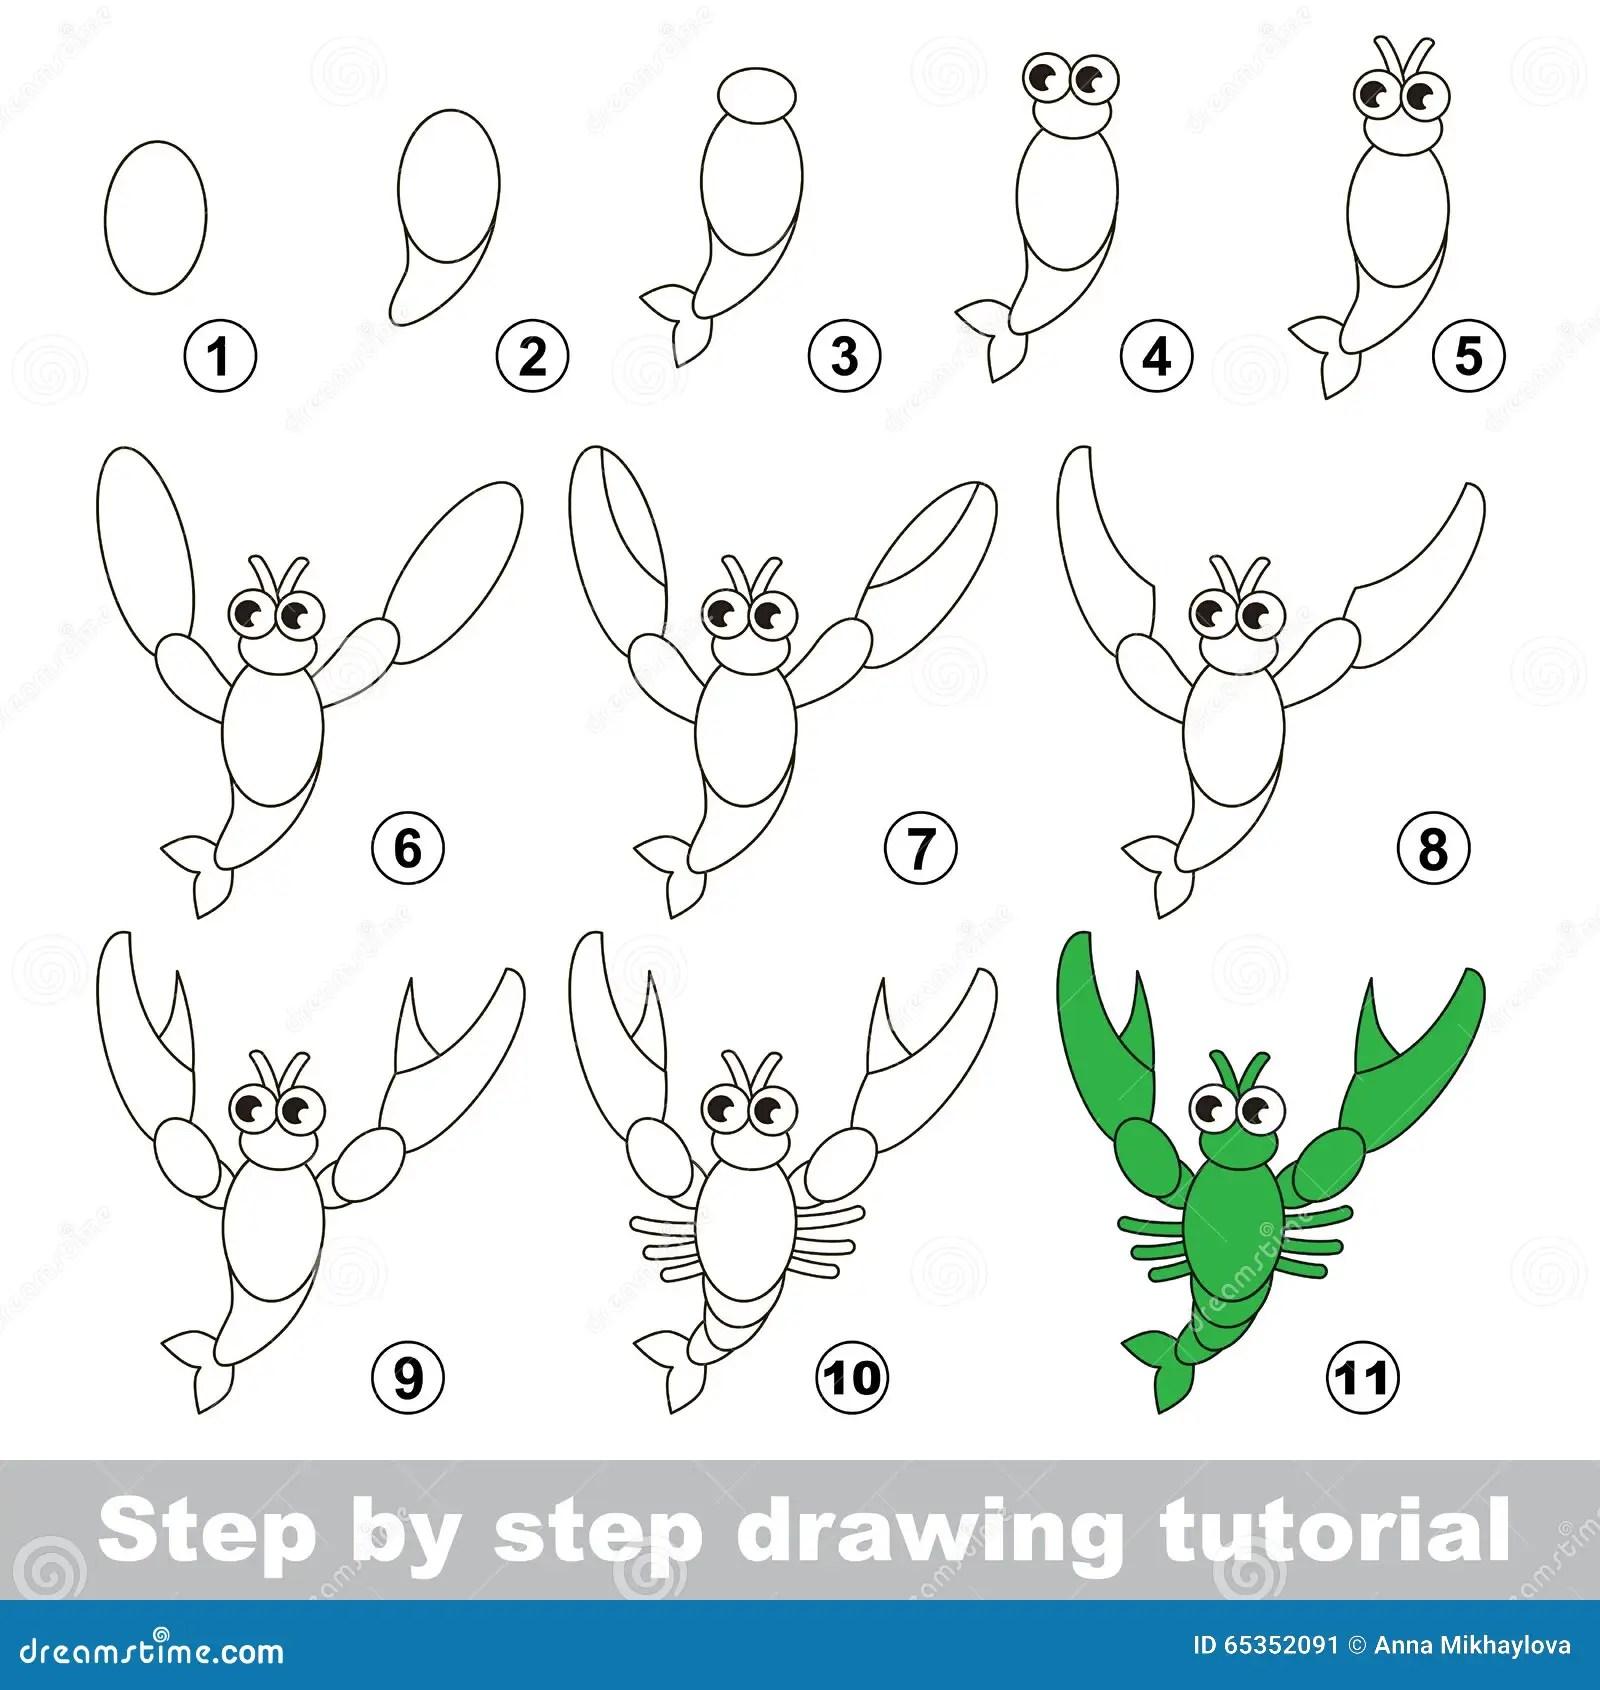 Tutorial Del Dibujo Como Dibujar Un Cangrejo Ilustracion